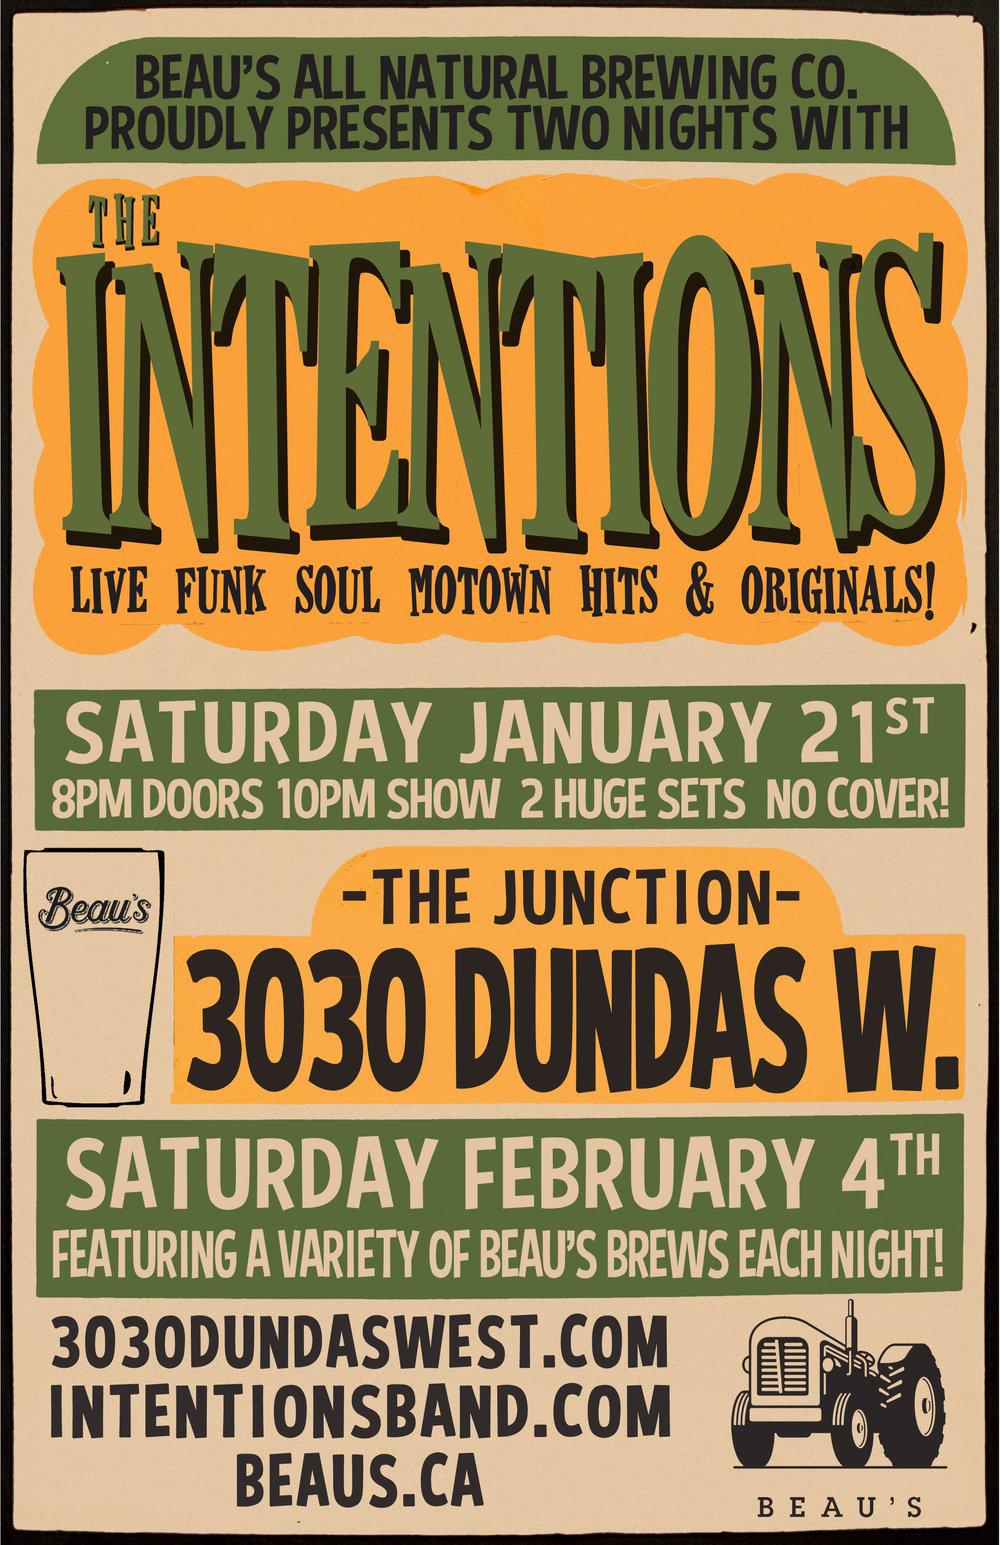 Intentions_Jan21.jpg